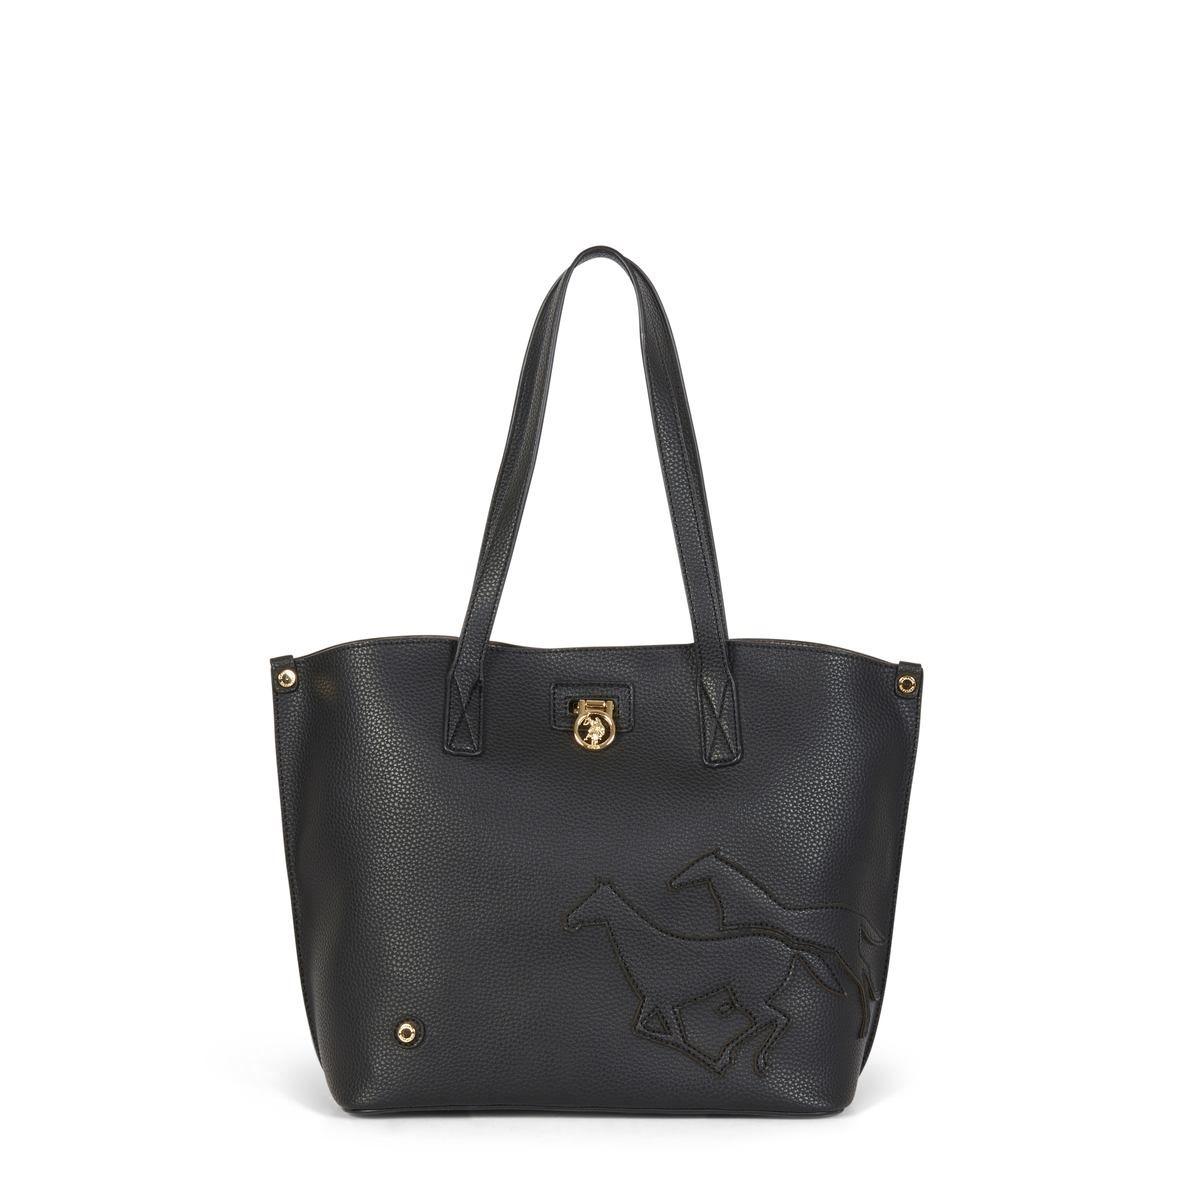 US Polo Assn. Τσάντα χειρός 29x13x27cm Newport Black